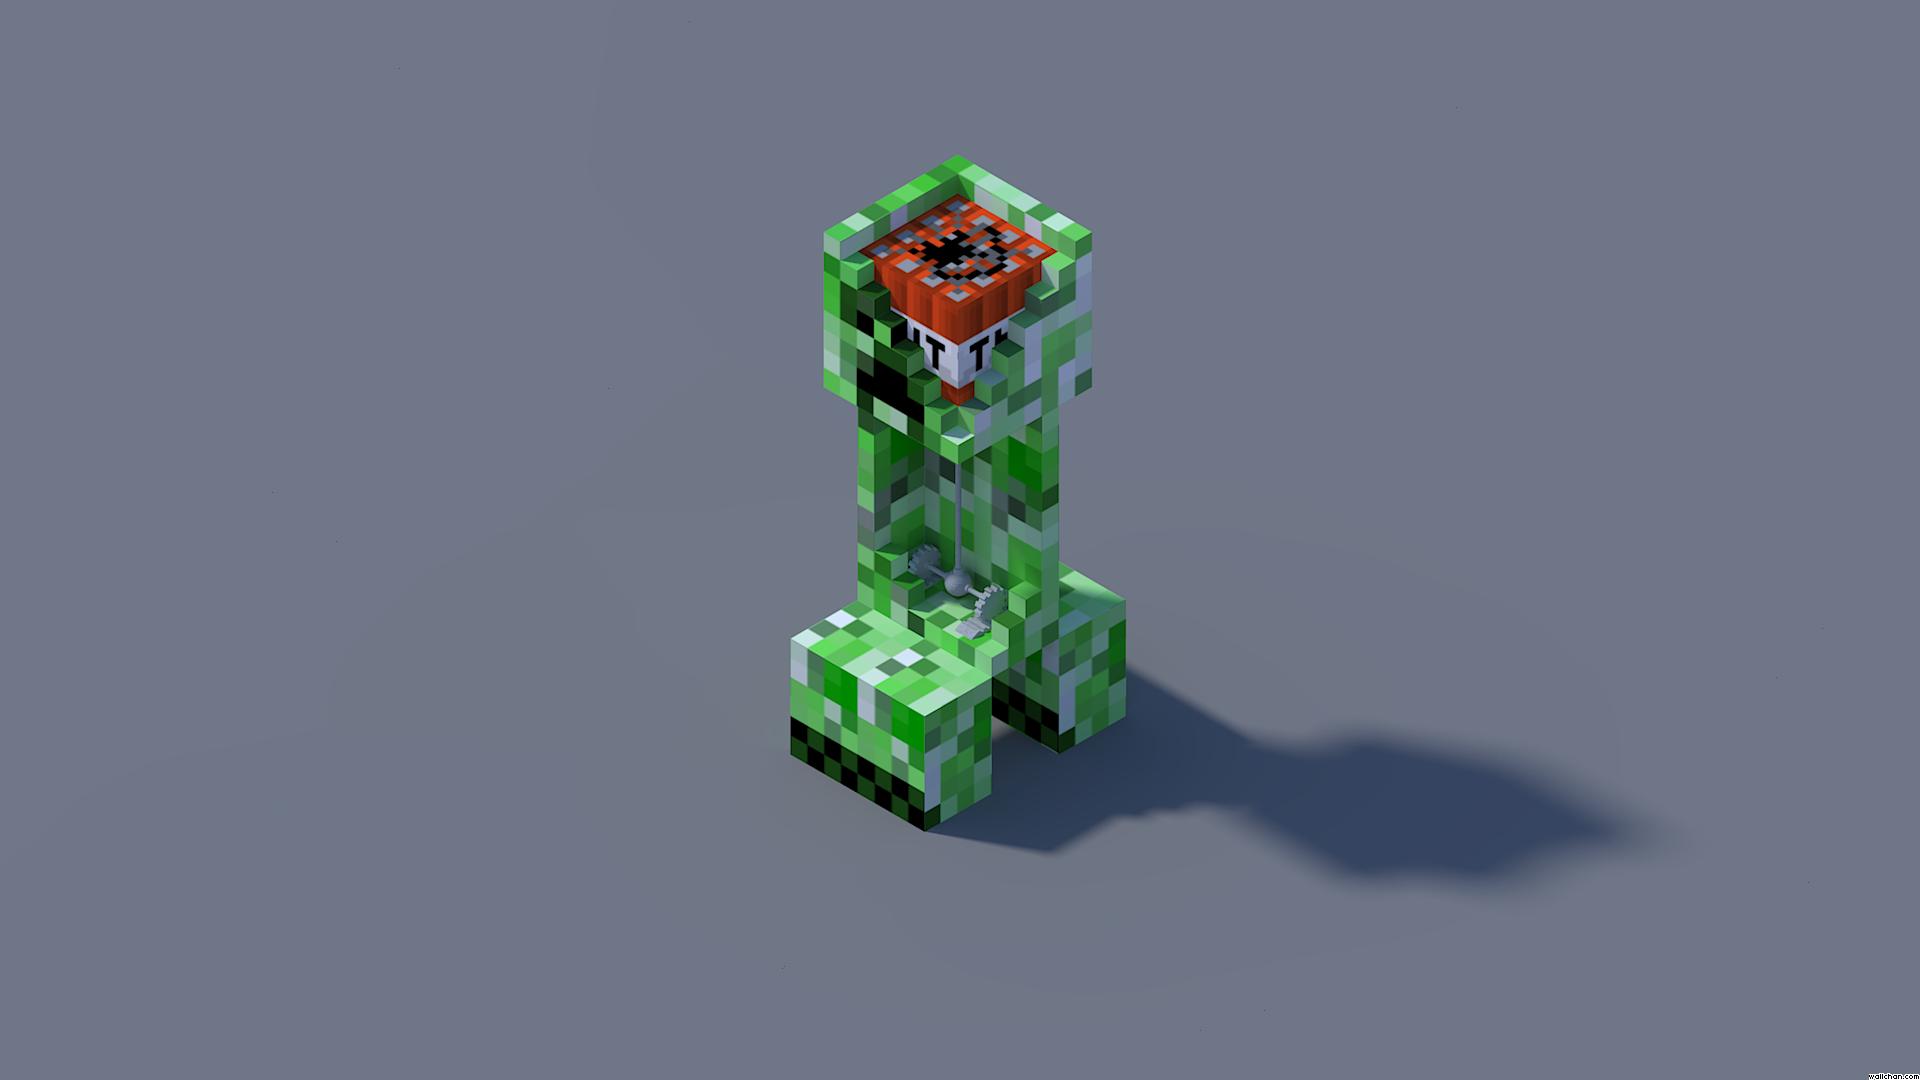 Fond Décran Minecraft Anatomie Dun Creeper